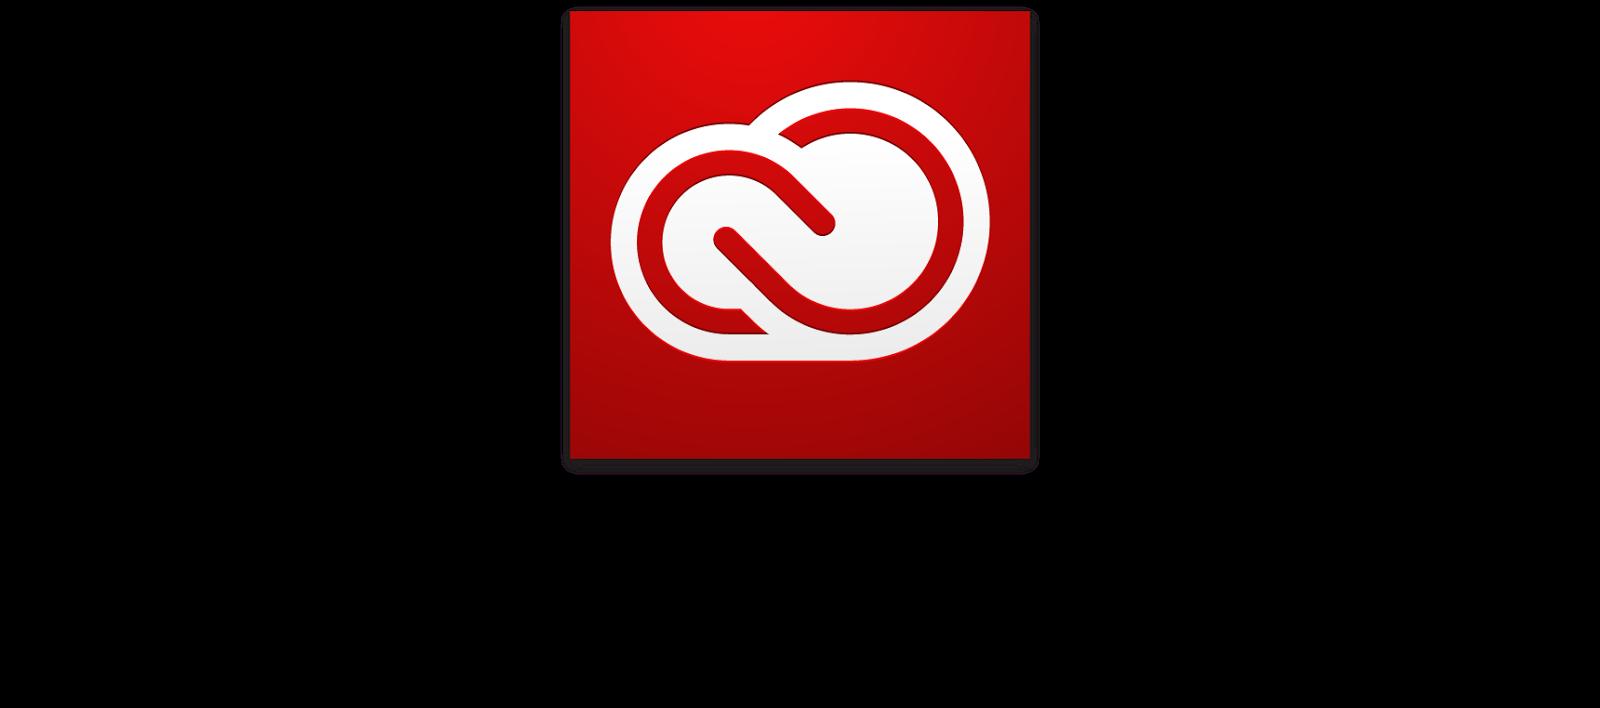 Can I Uninstall Adobe Creative Cloud